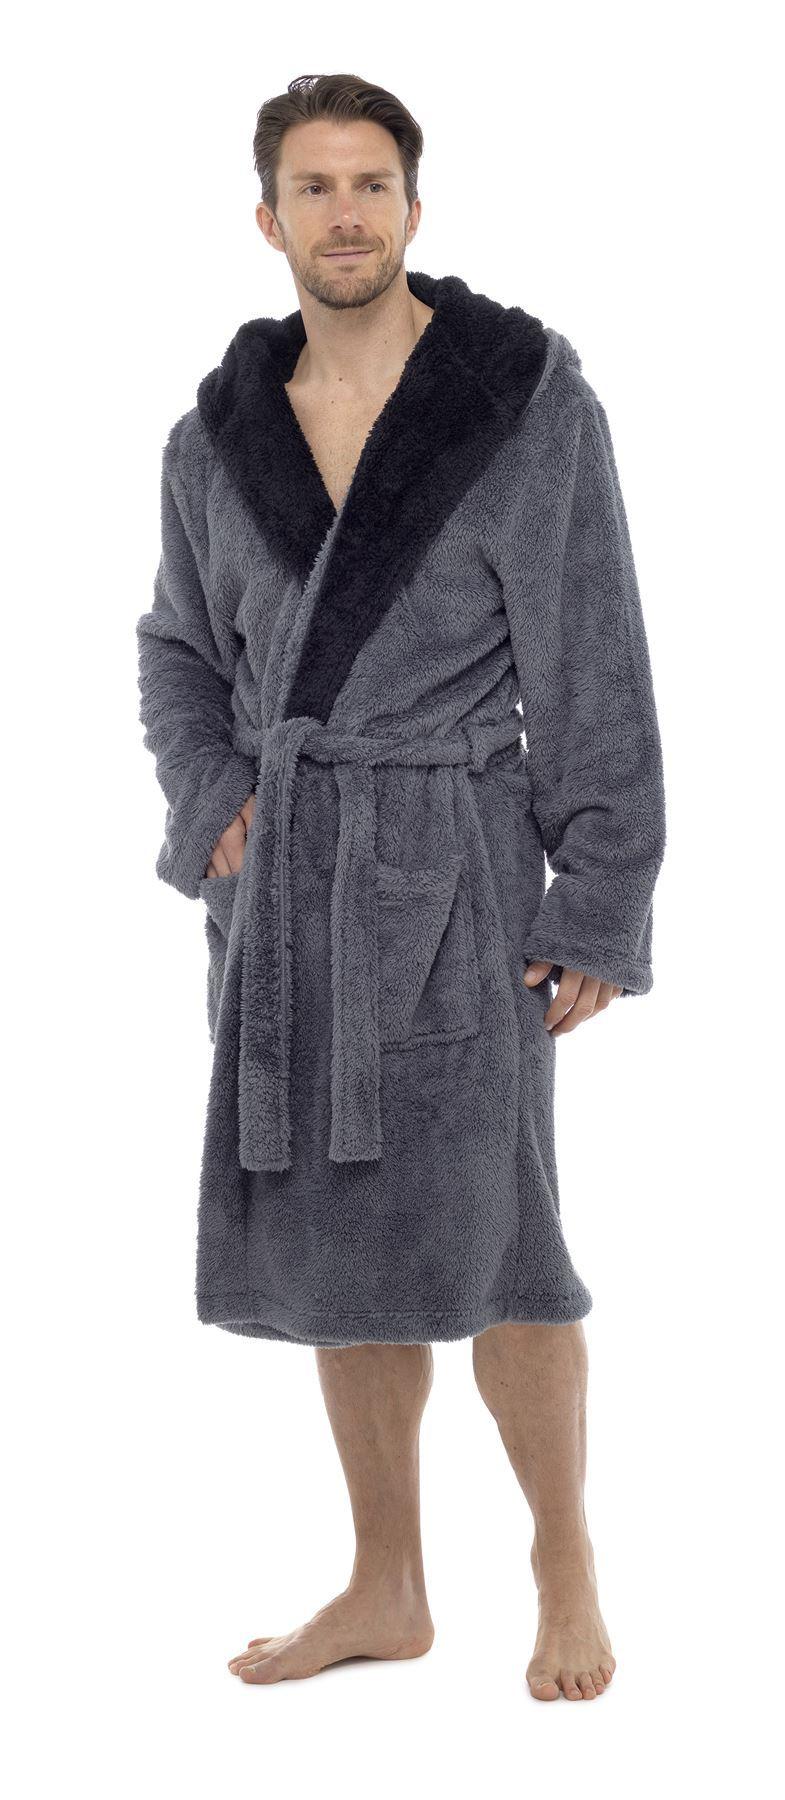 Men S Snuggle Fleece Robe Luxury Super Soft Hooded